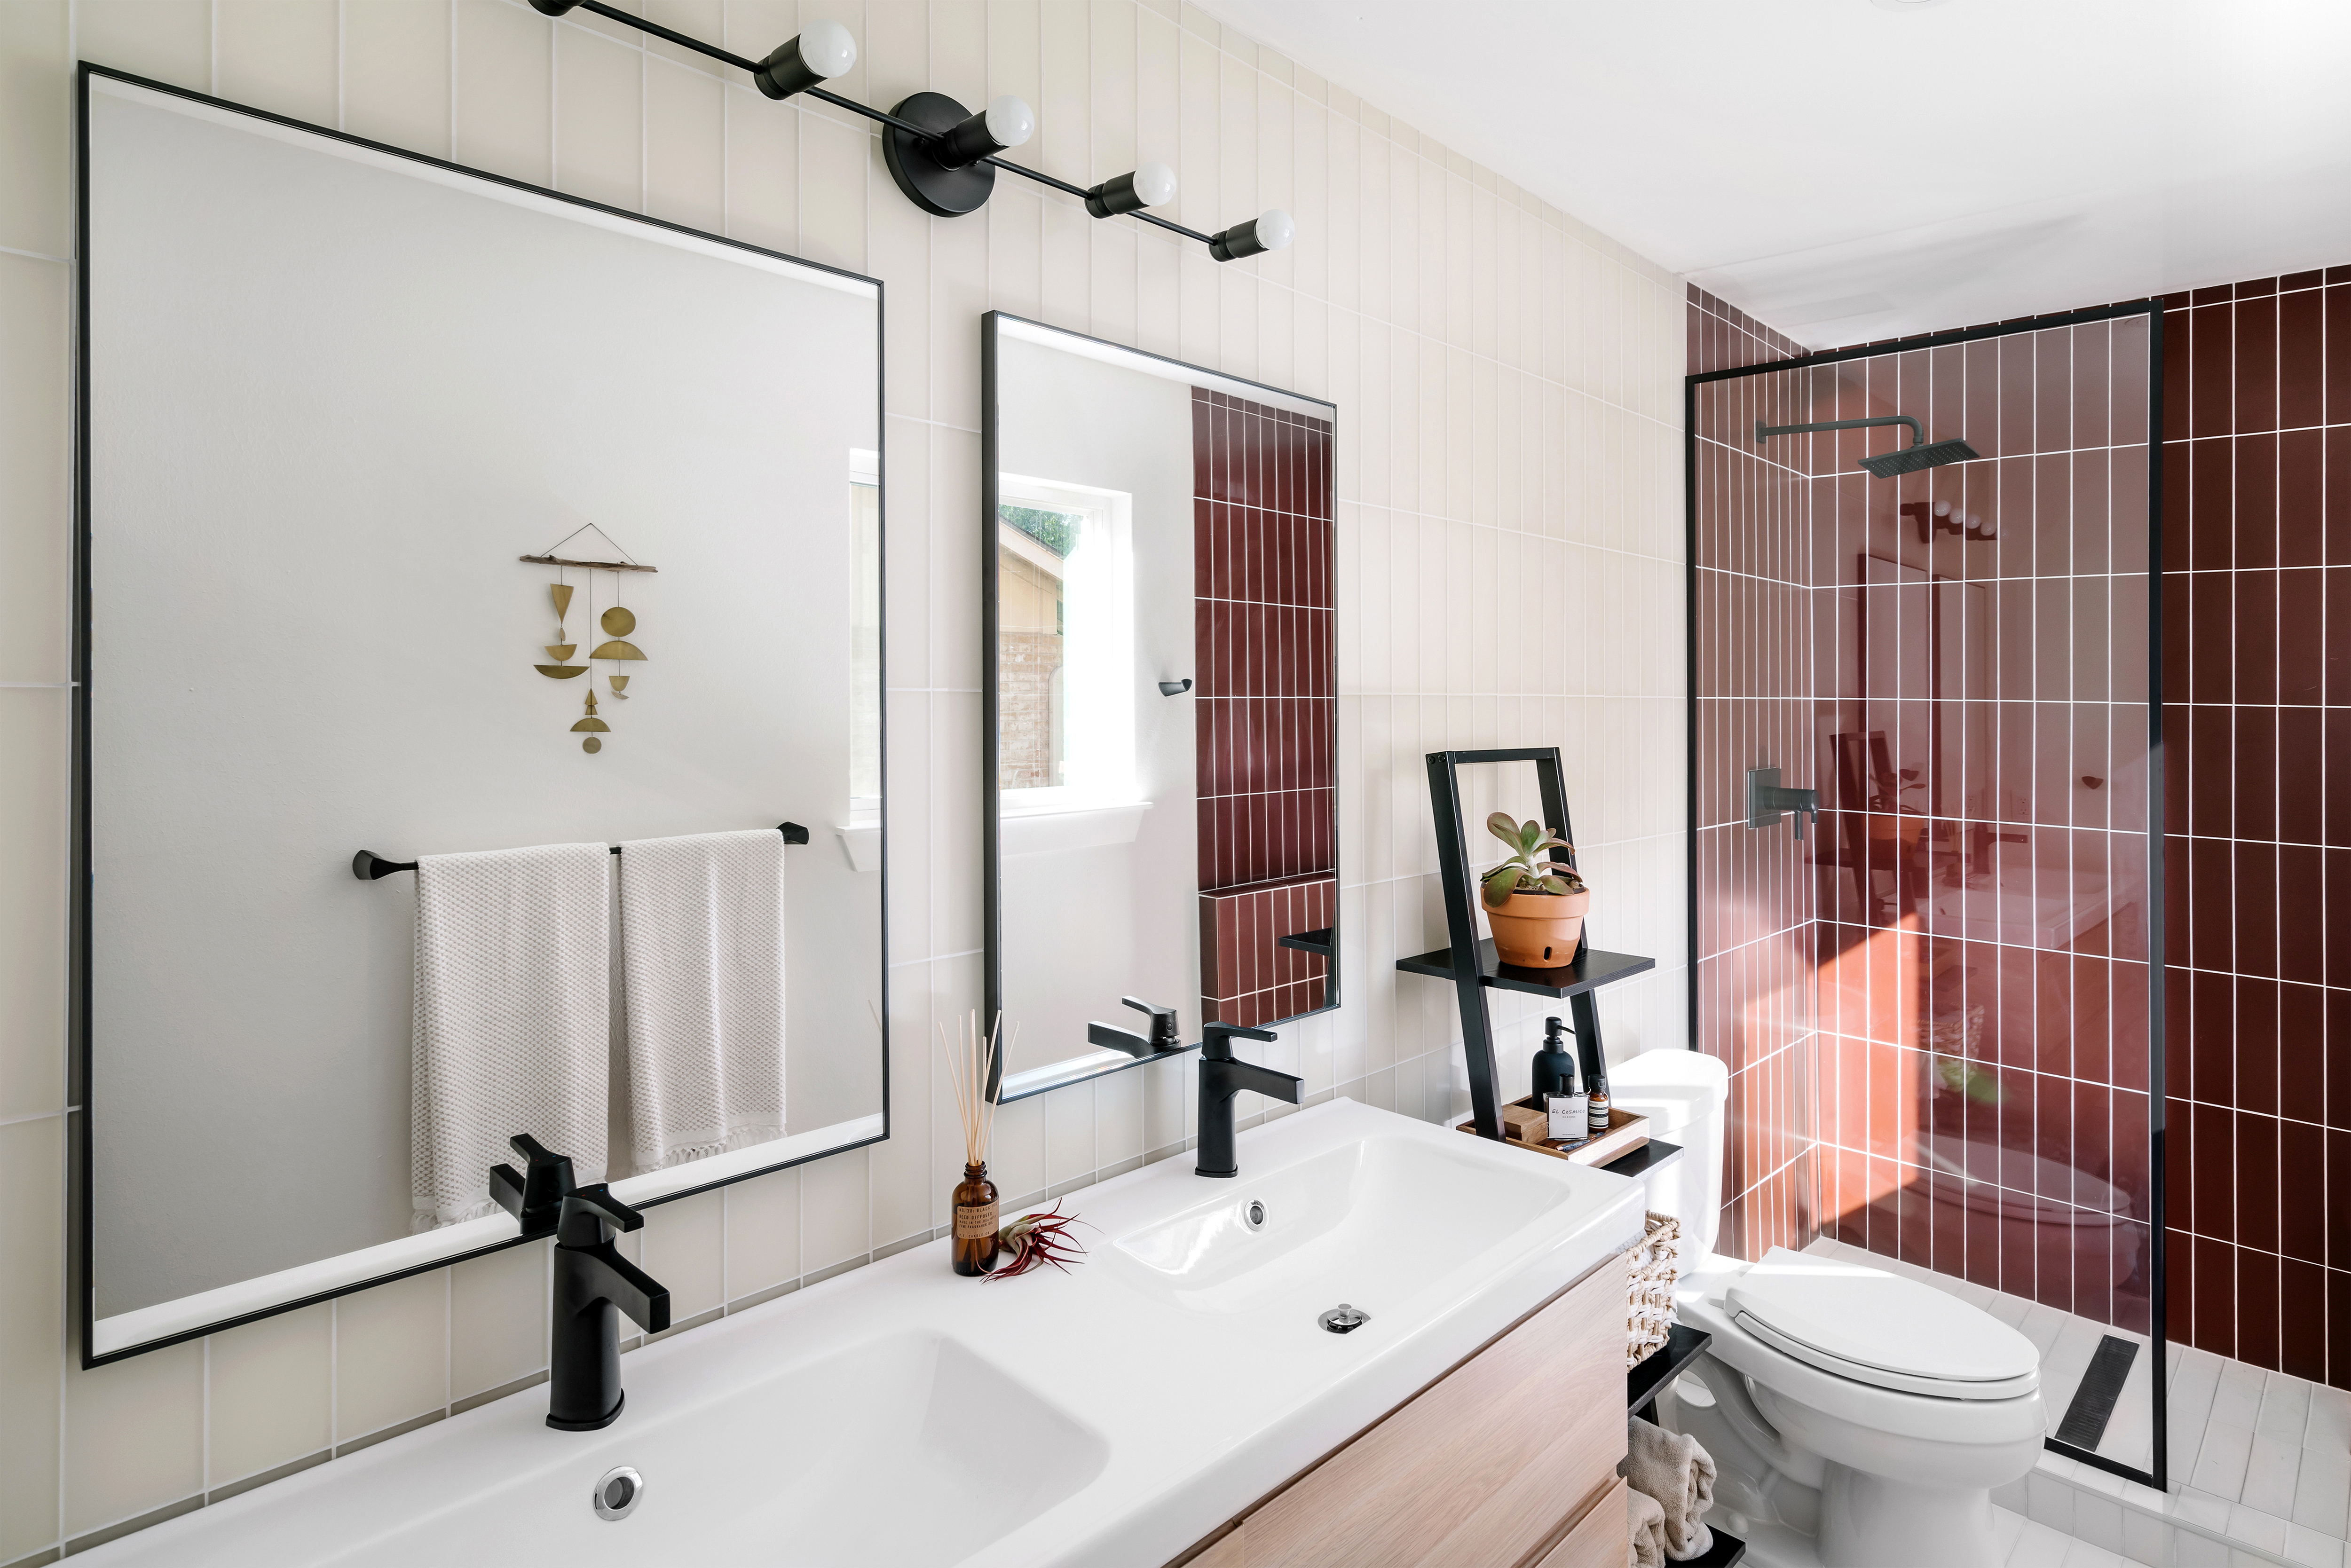 BLOG-2019_Q2_image_residential_full-rights_influencer_design_photo_chase-daniel_bathroom_shower_walls_glass_pheasant-matte_sparrow-matte_3x12_floor_tile_3x12_halite_vertical_straight-set_sink_vanity_FC-263094_FC-263091.jpg?mtime=20190508154748#asset:451618